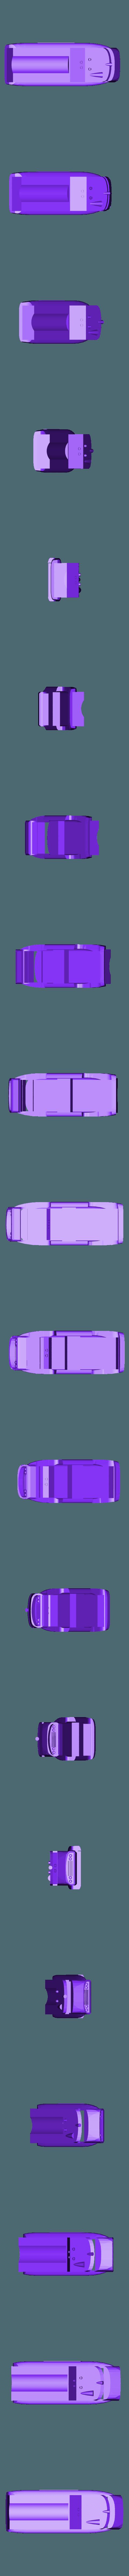 scarlet tanker 2.stl Download STL file captain scarlet tanker thunderbirds • 3D printer model, platt980